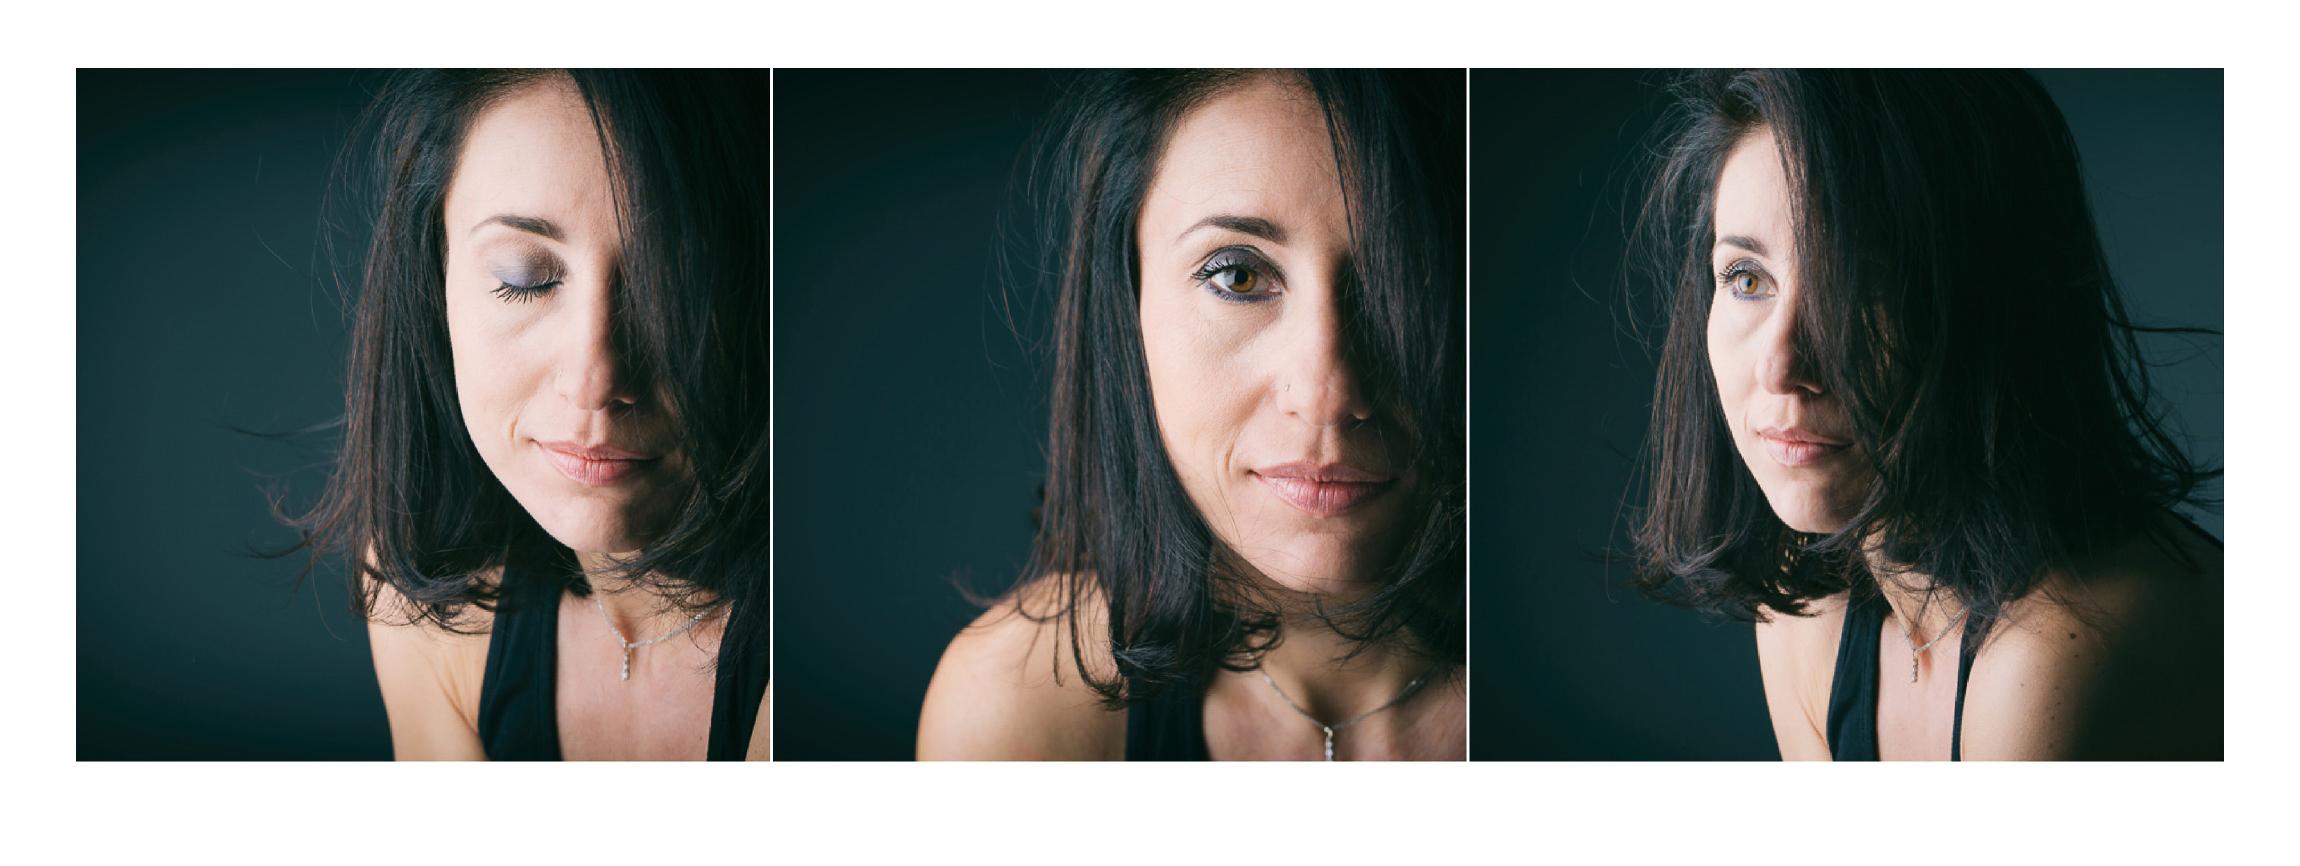 05-foto-professional-celine-pech-andorra-07